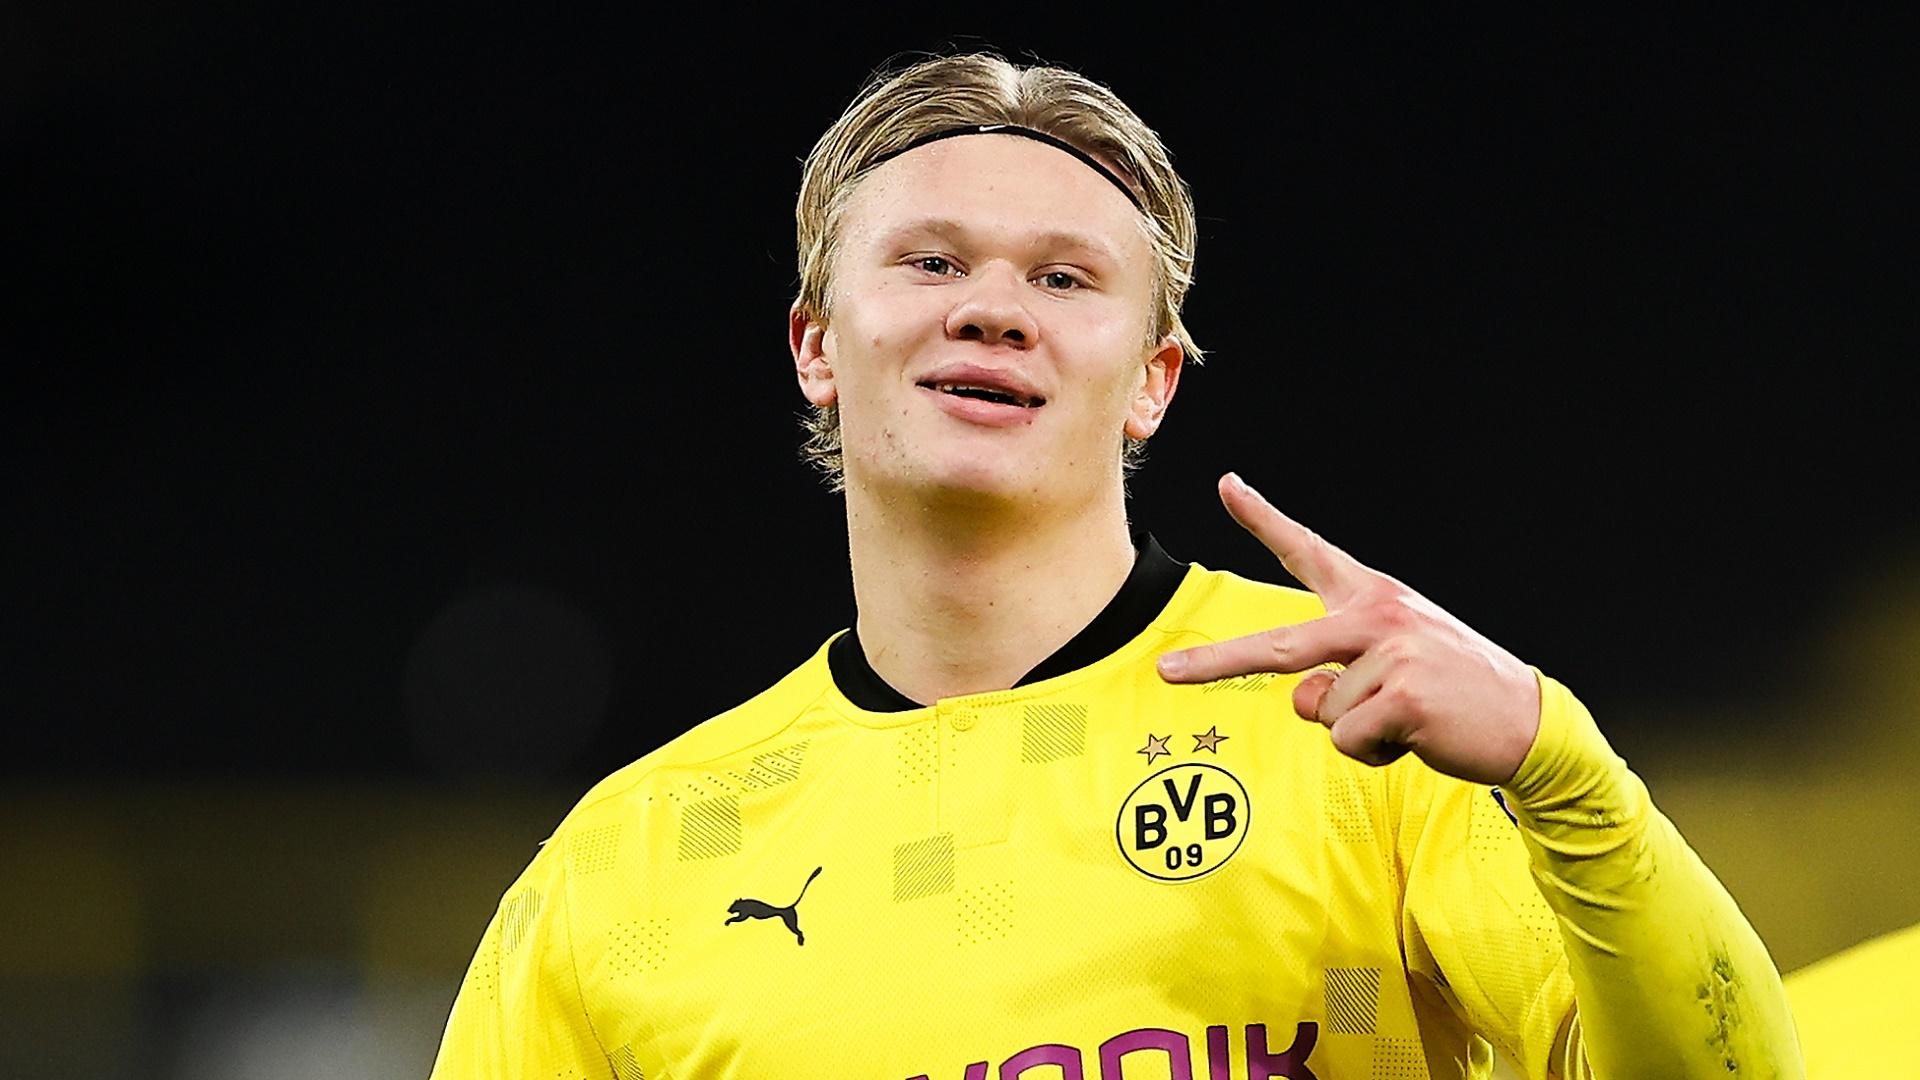 Haaland fit to return after Bundesliga Christmas break, confirms Dortmund chief Zorc